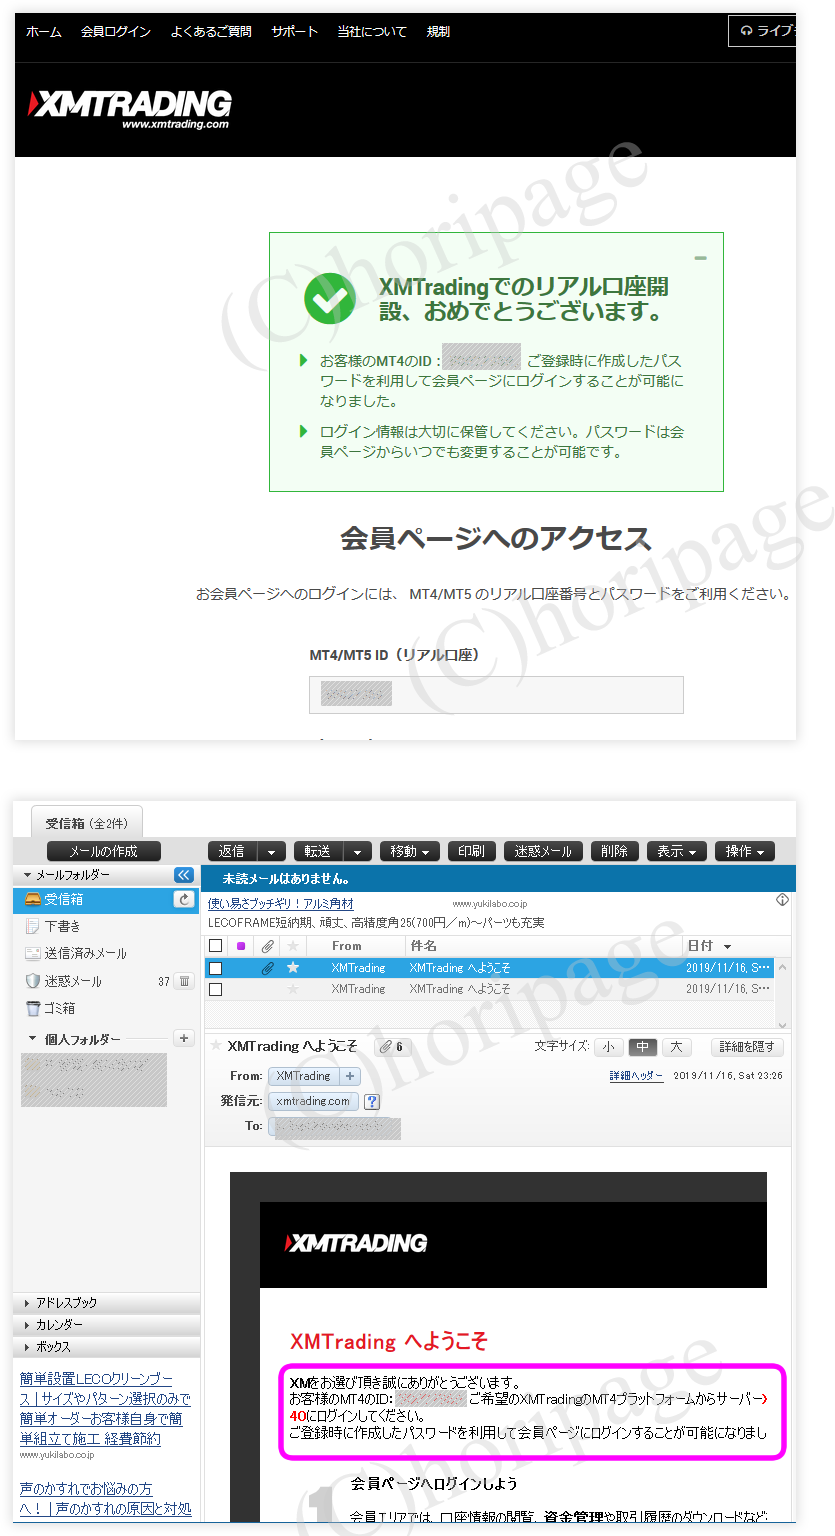 XMリアル口座の登録手順の解説図9